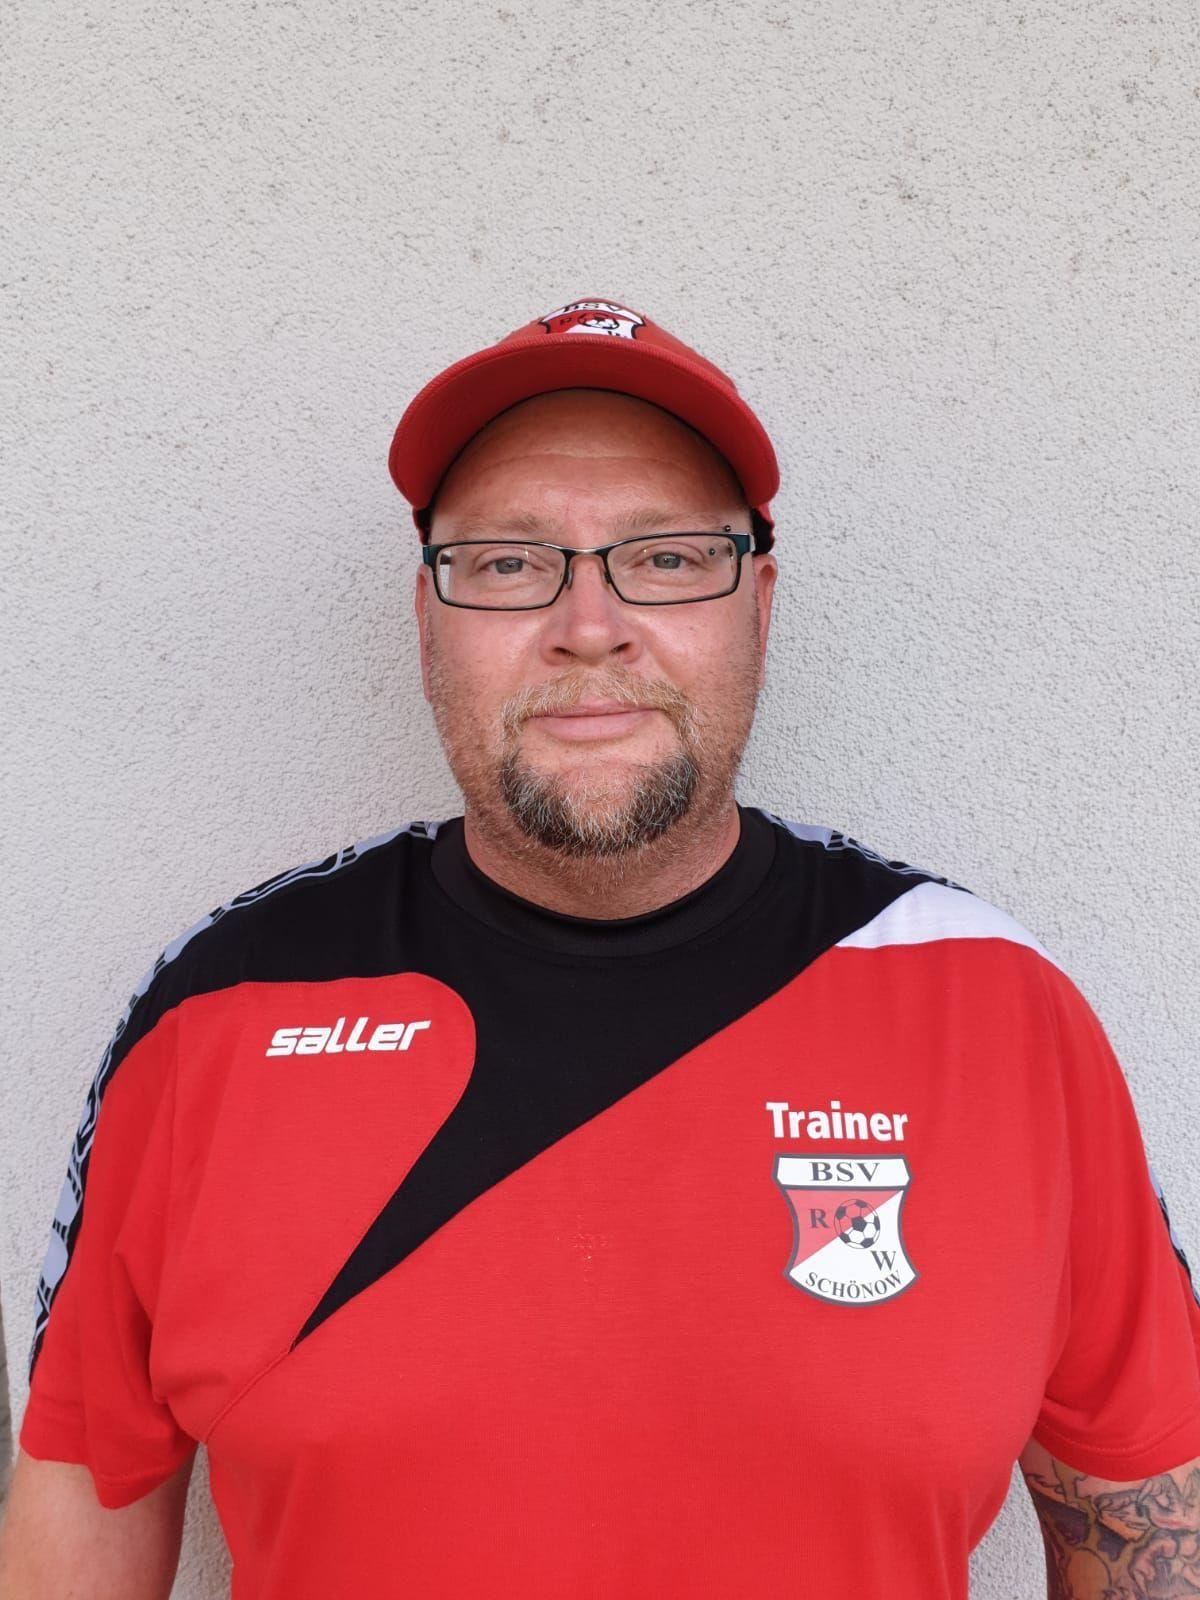 B - Junioren (Jahrgänge 2005/2006)